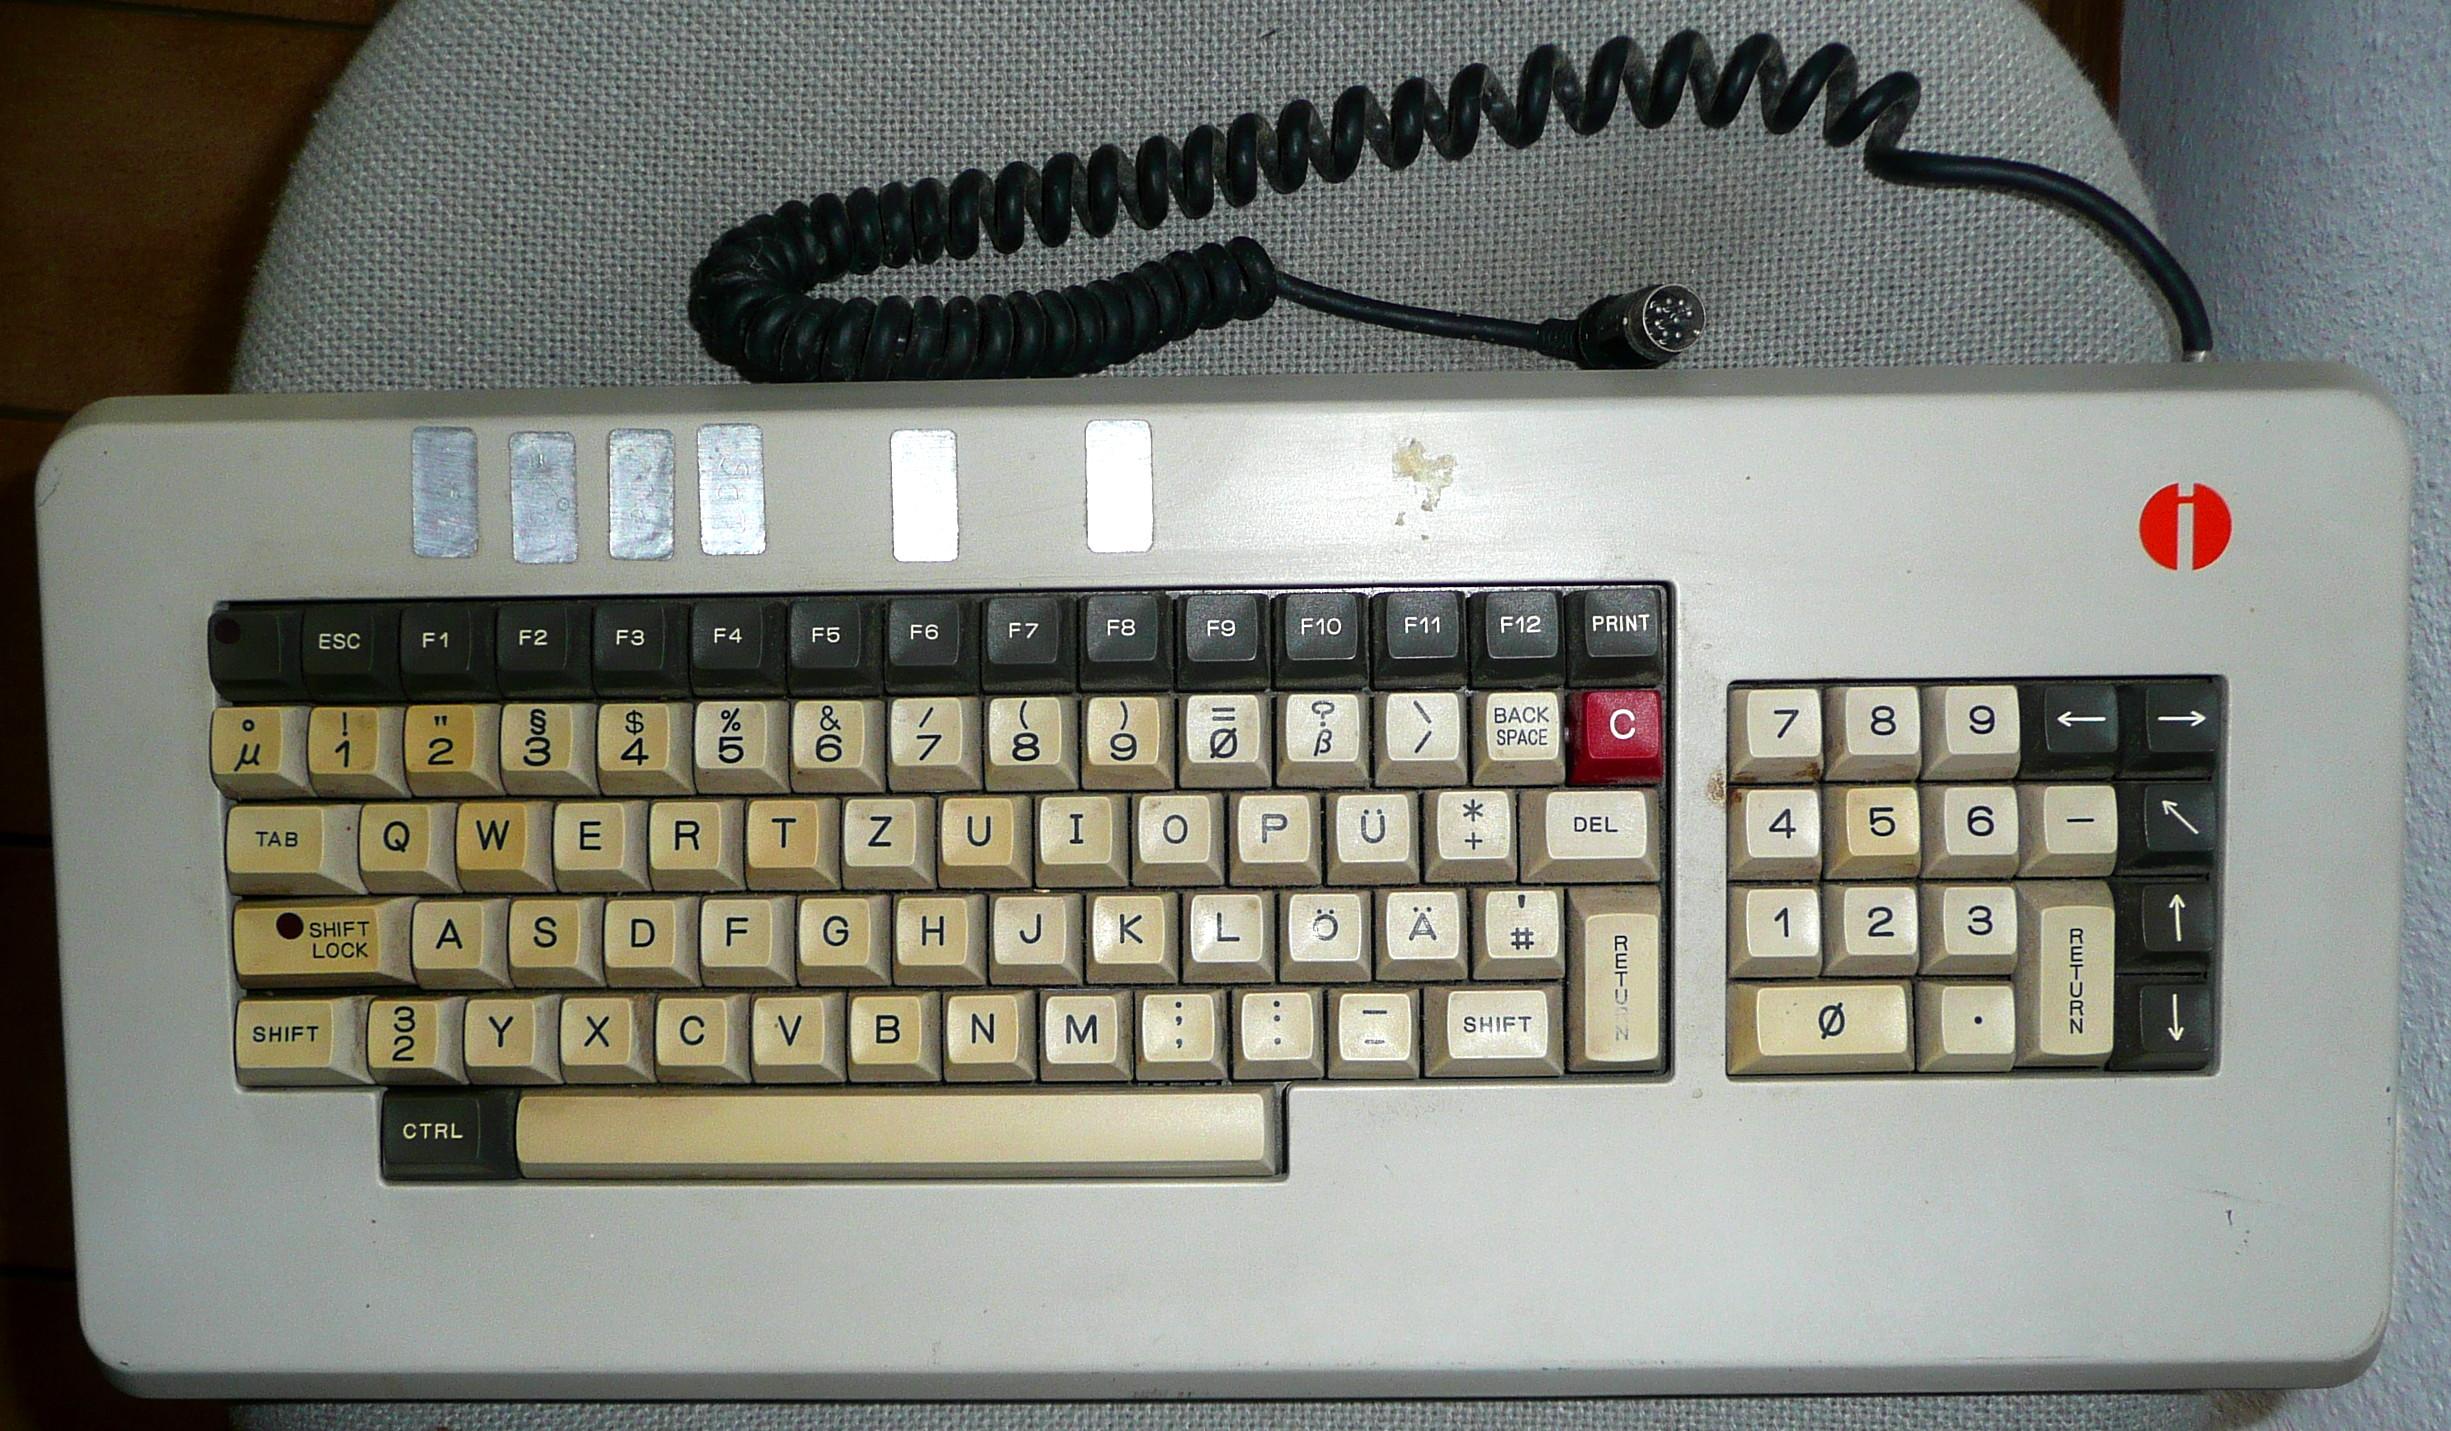 P1040821.JPG